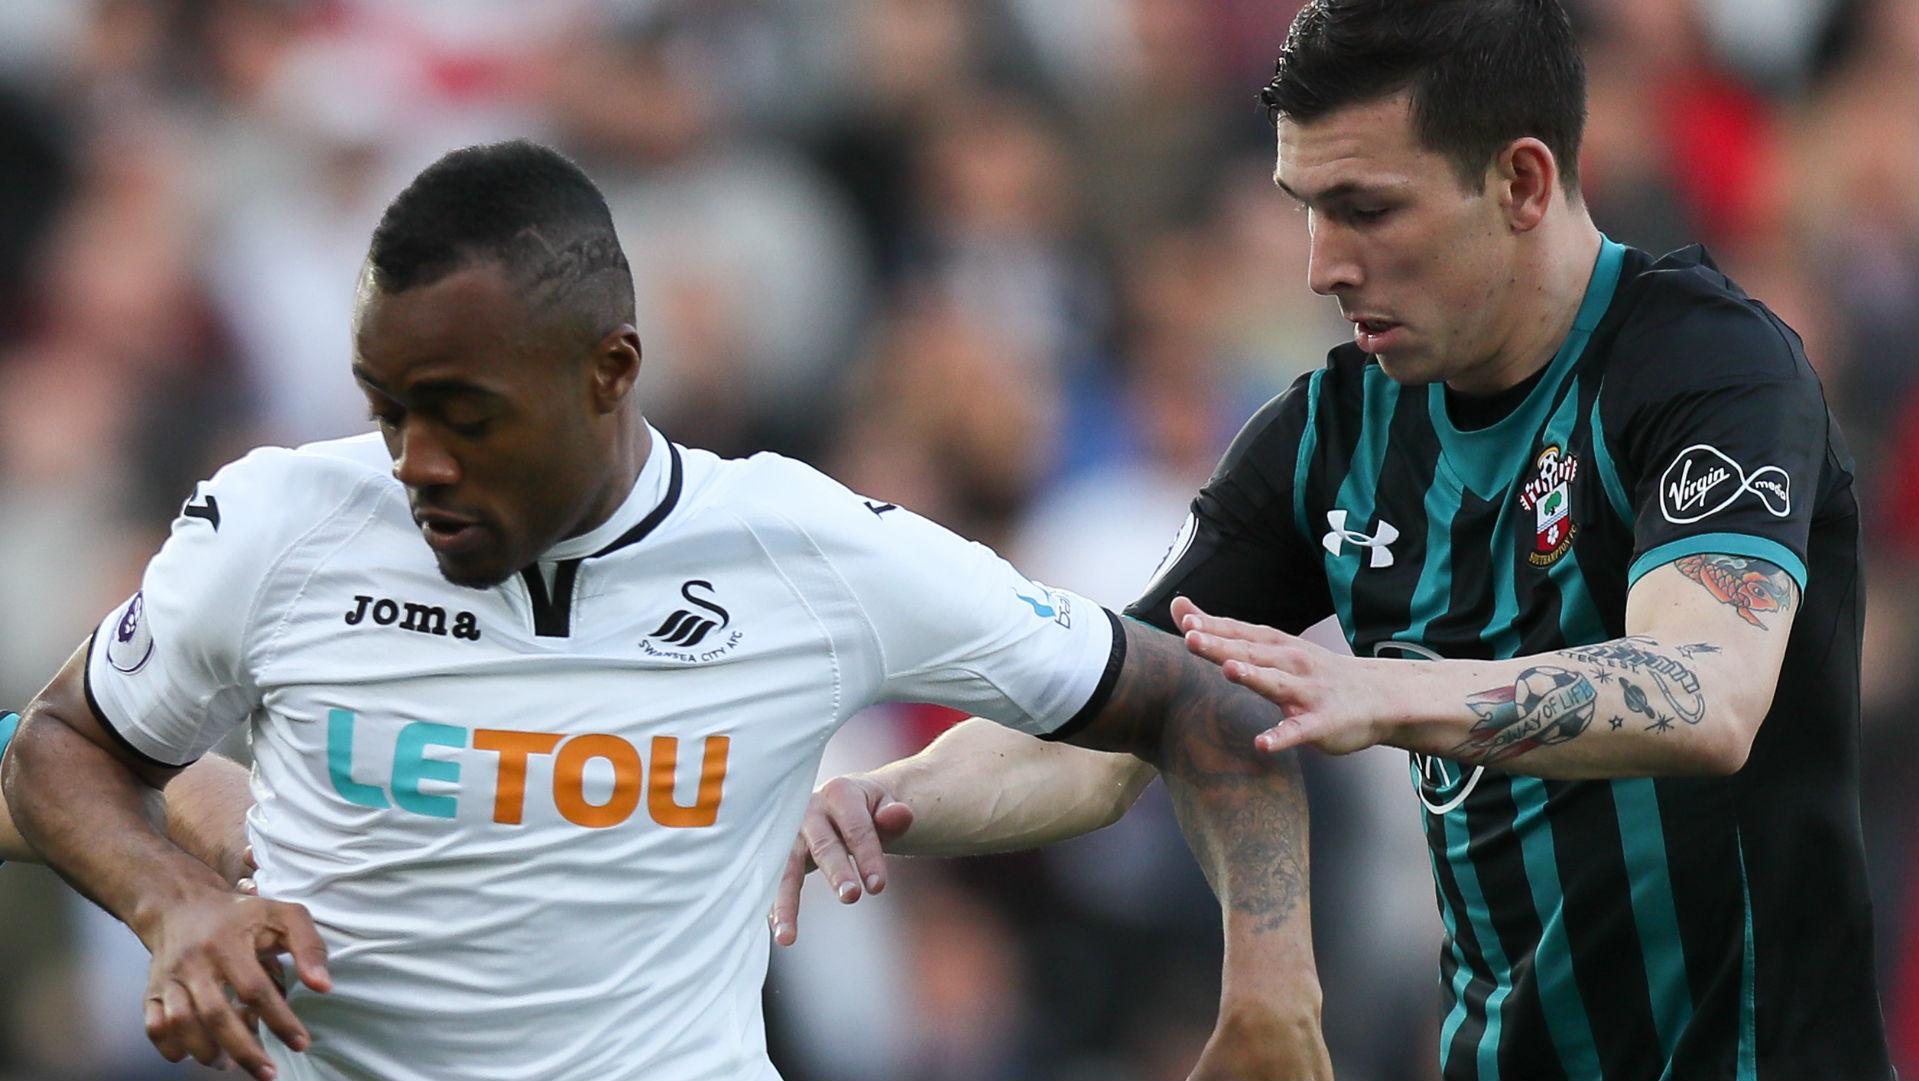 Jordan Ayew Swansea City Pierre-Emile Hojbjerg Southampton 2017-18